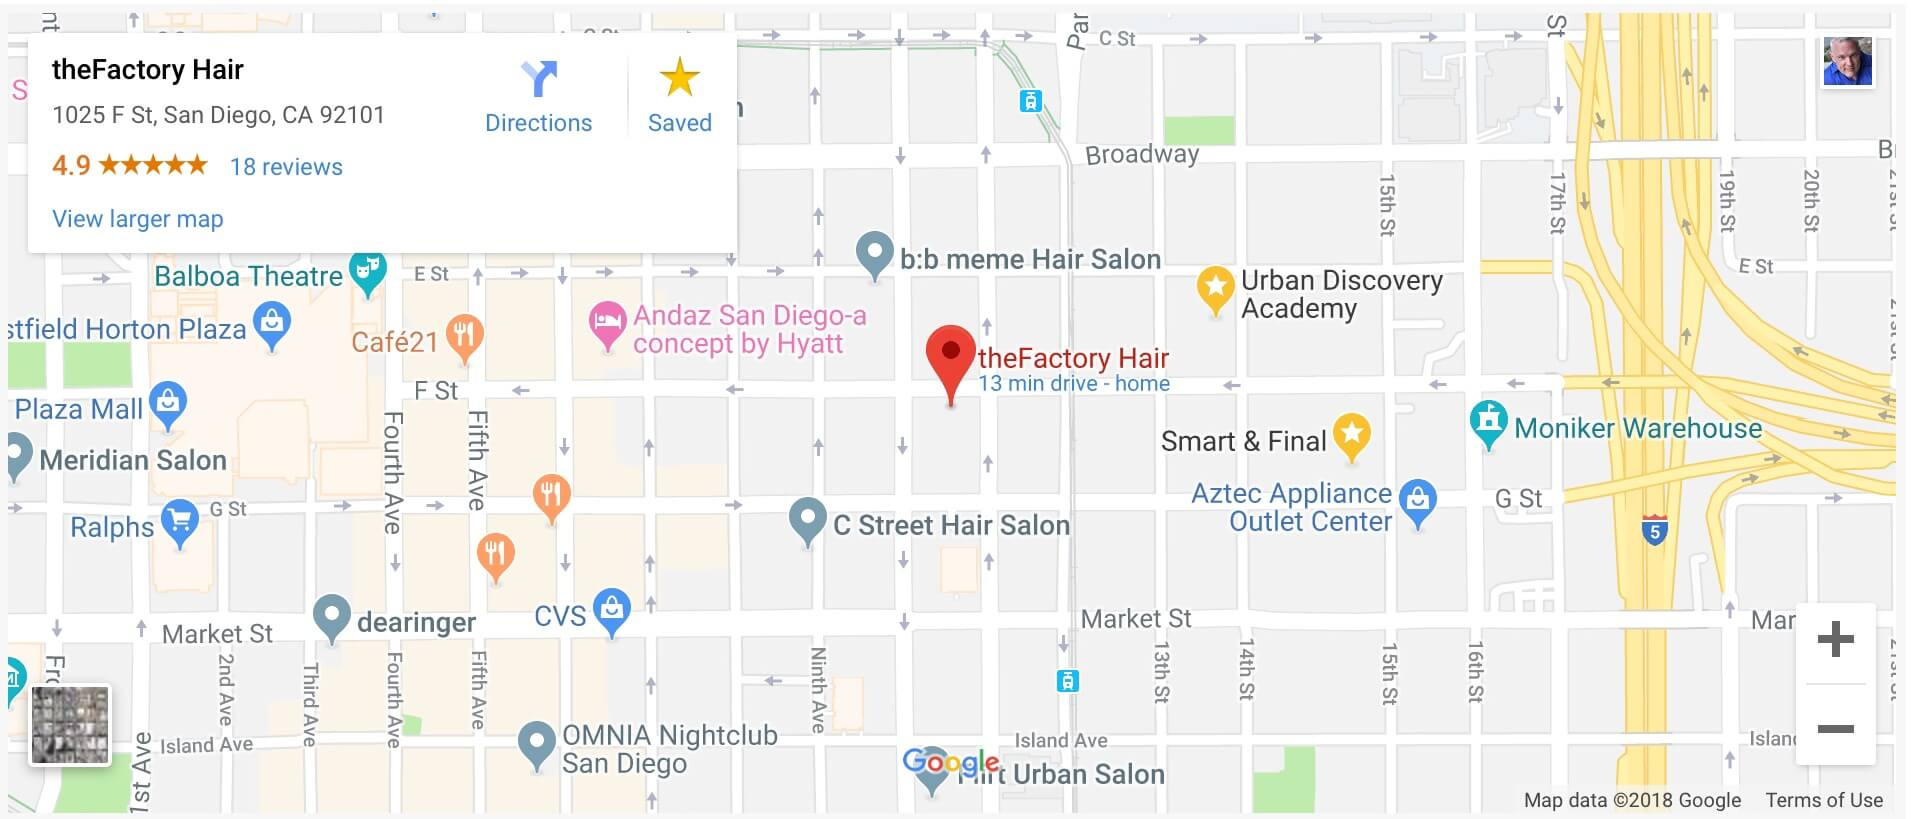 thefactoryHair Map